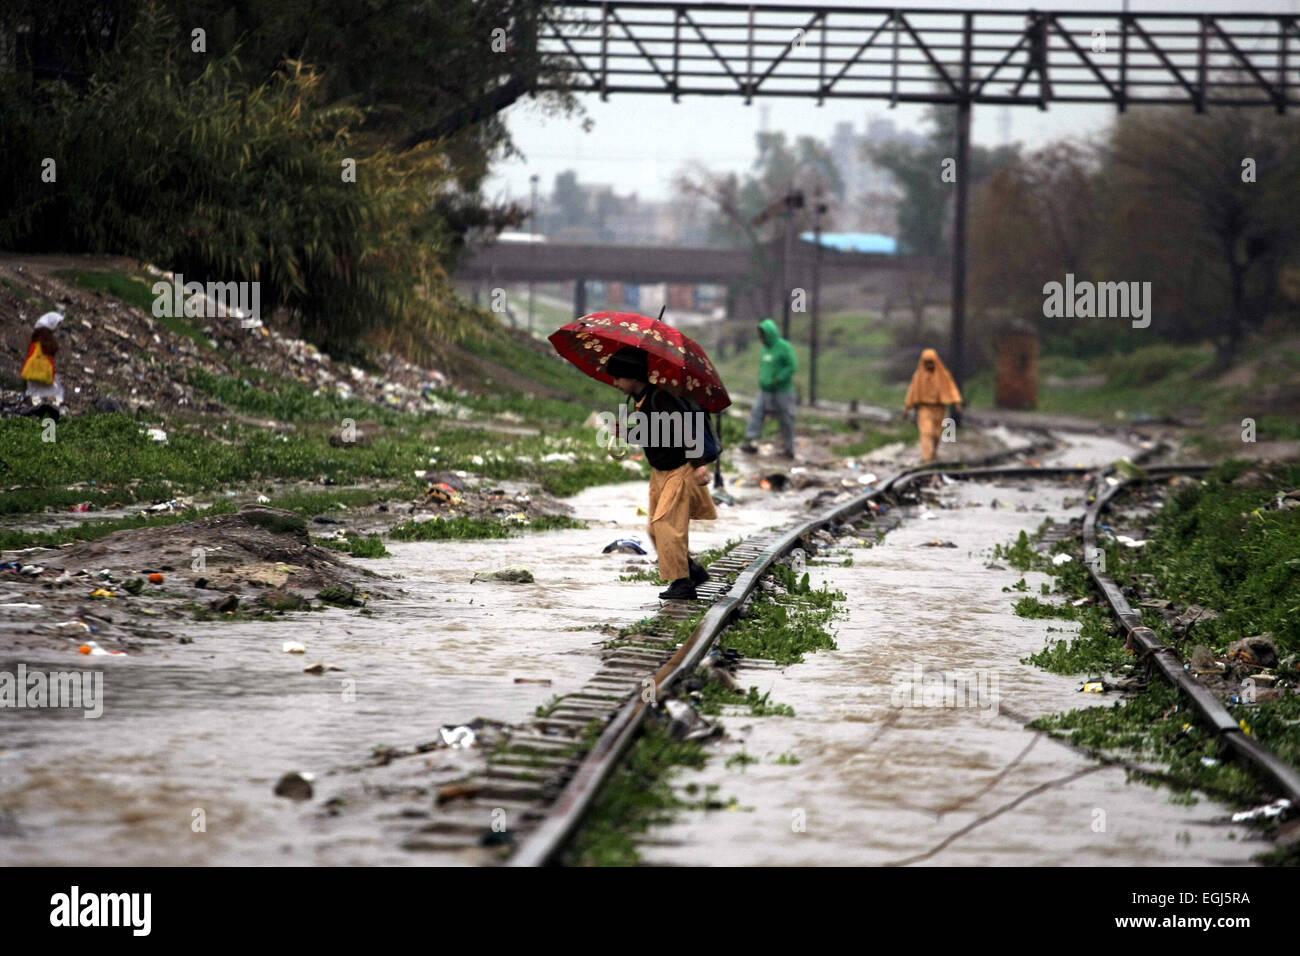 Peshawar, Pakistan. 25th Feb, 2015. A school boy crosses a waterlogged railway track after heavy rain in northwest - Stock Image